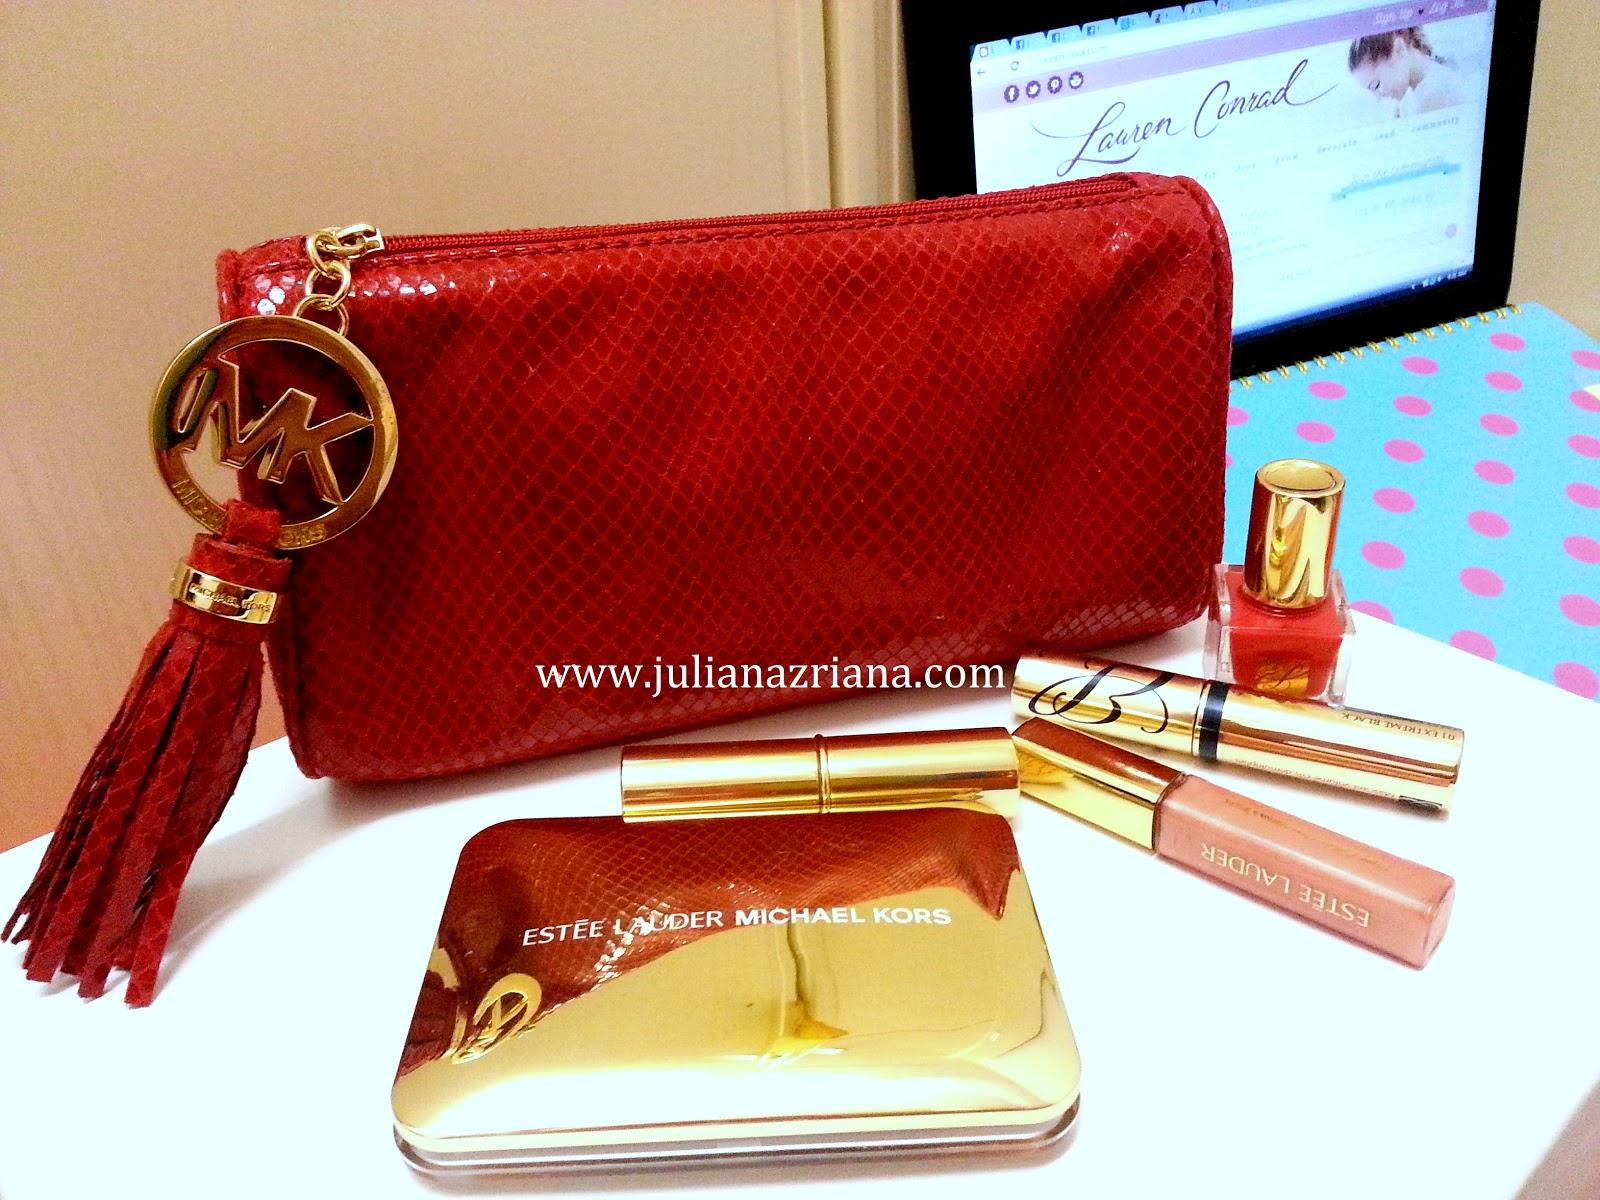 Michael Kors Estee Lauder Gift Set